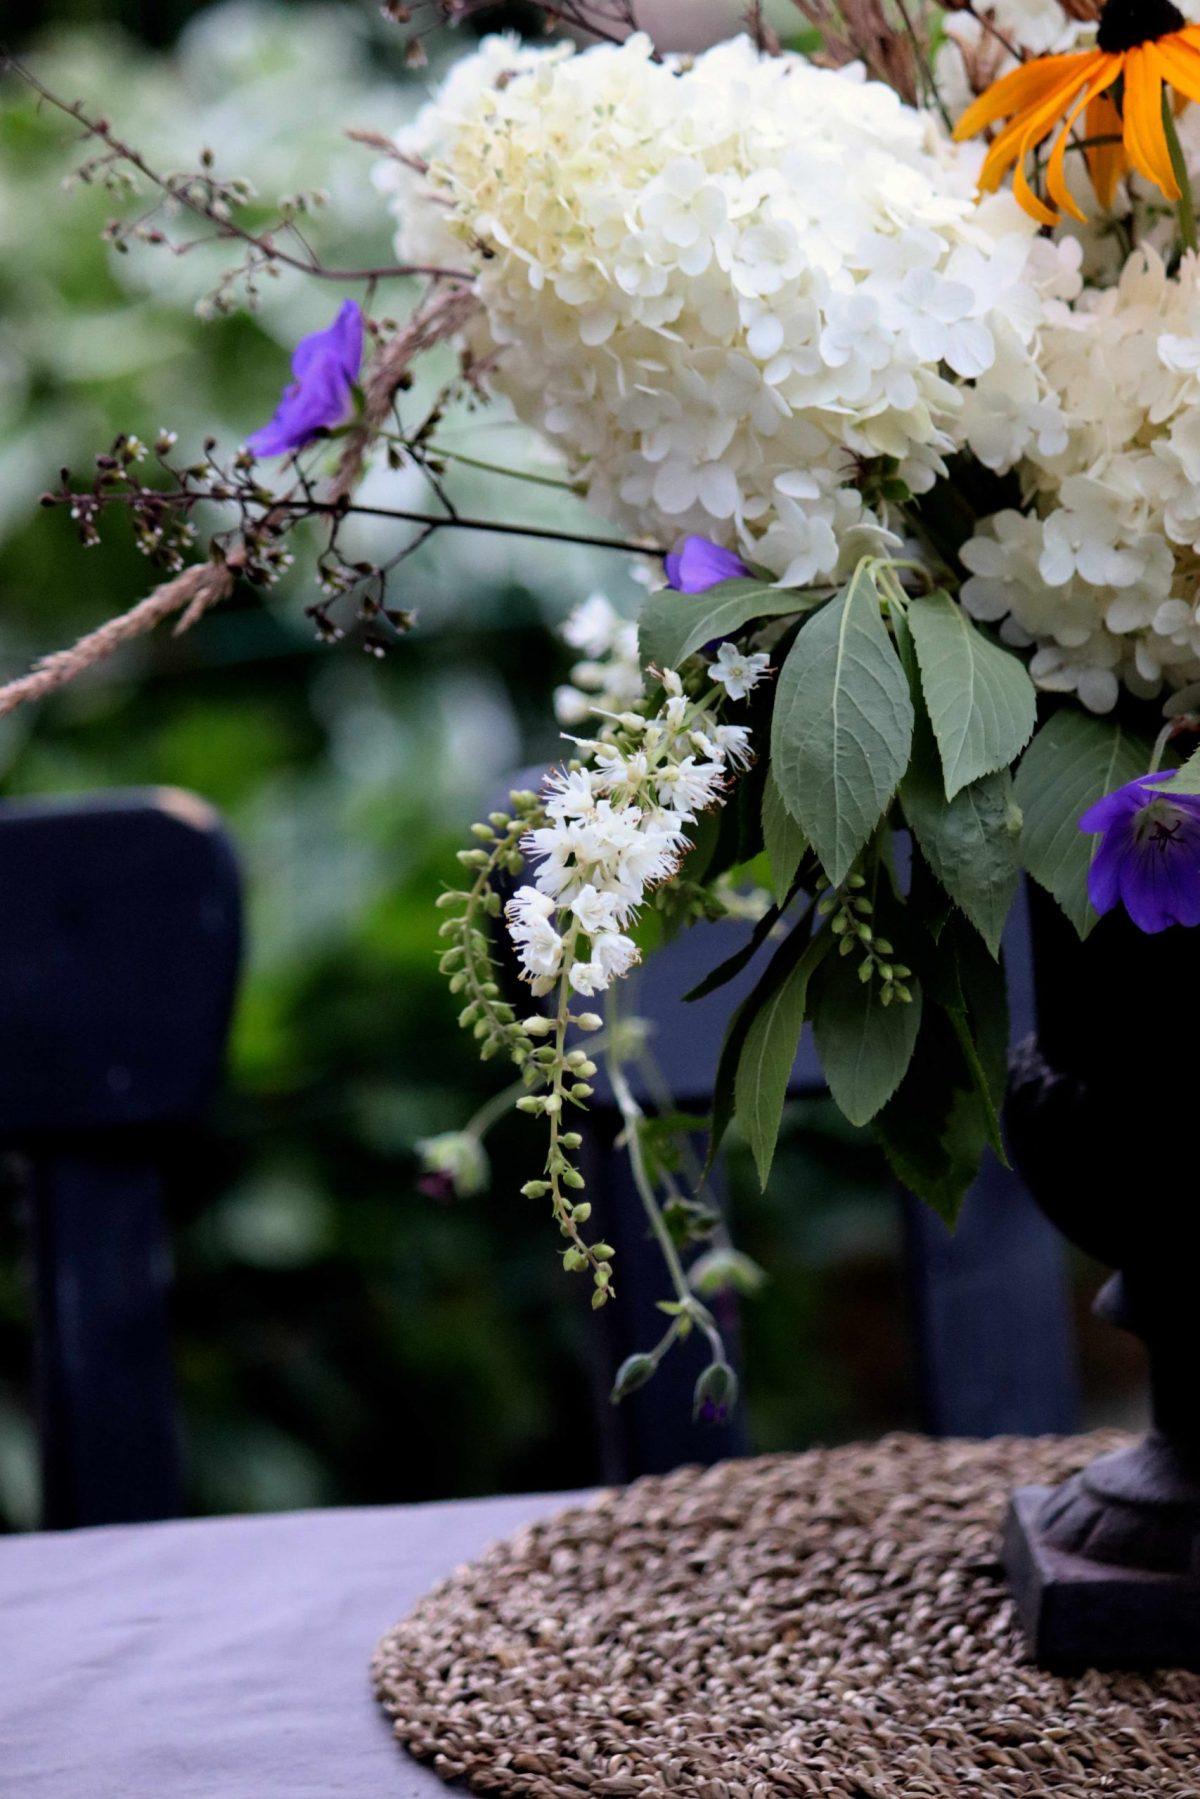 Natalia Lindberg Trädgårdsdesign blomarrangemang hortensia rudbekia urna konvaljbuske trädgårdnäva